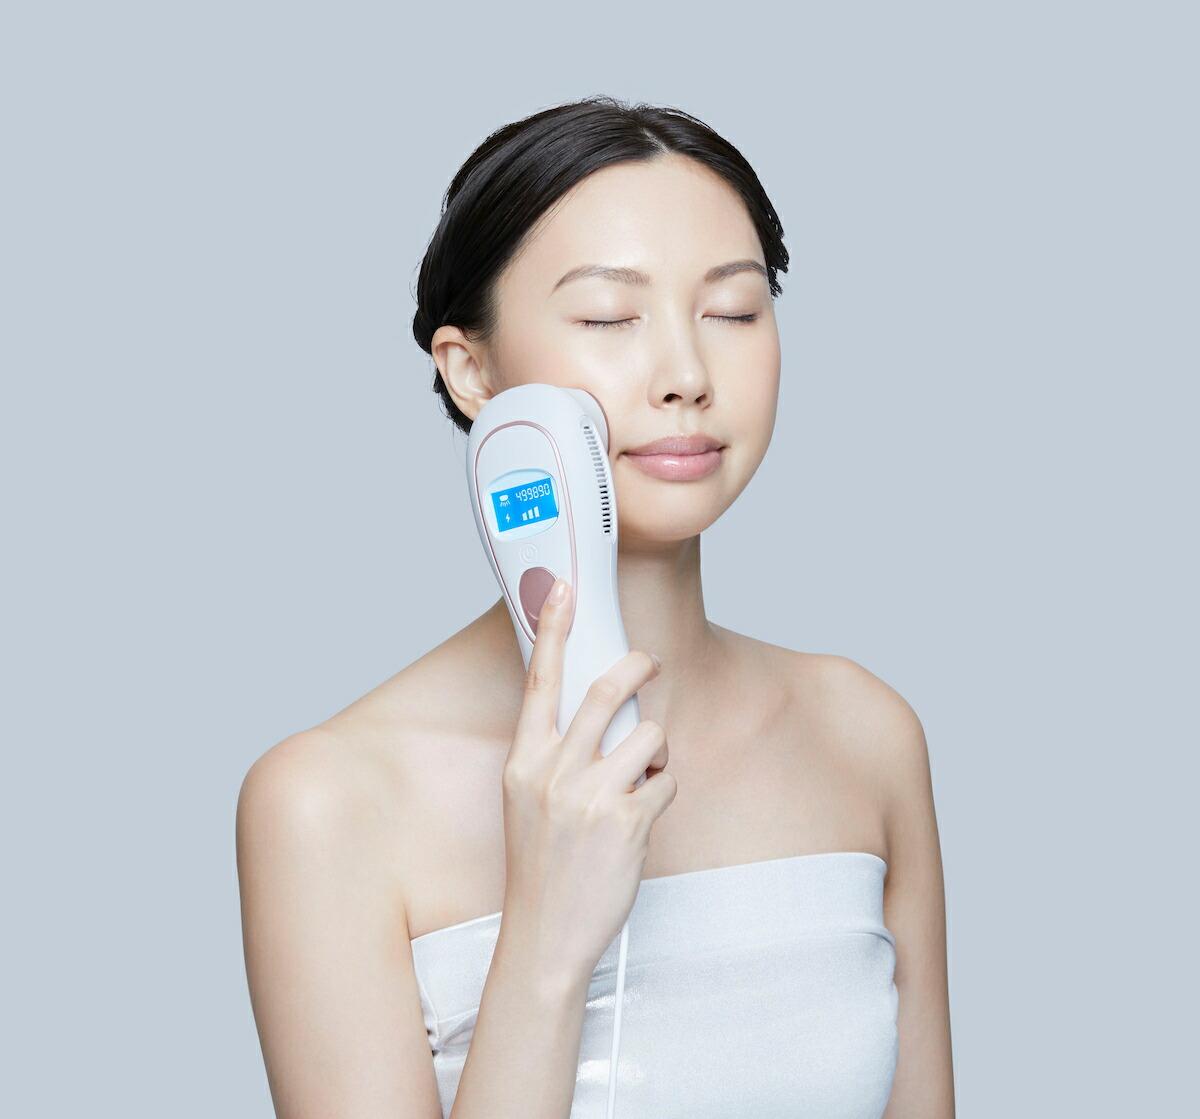 llexam(レクサム) 多機能温冷美顔器 MXFC-1000